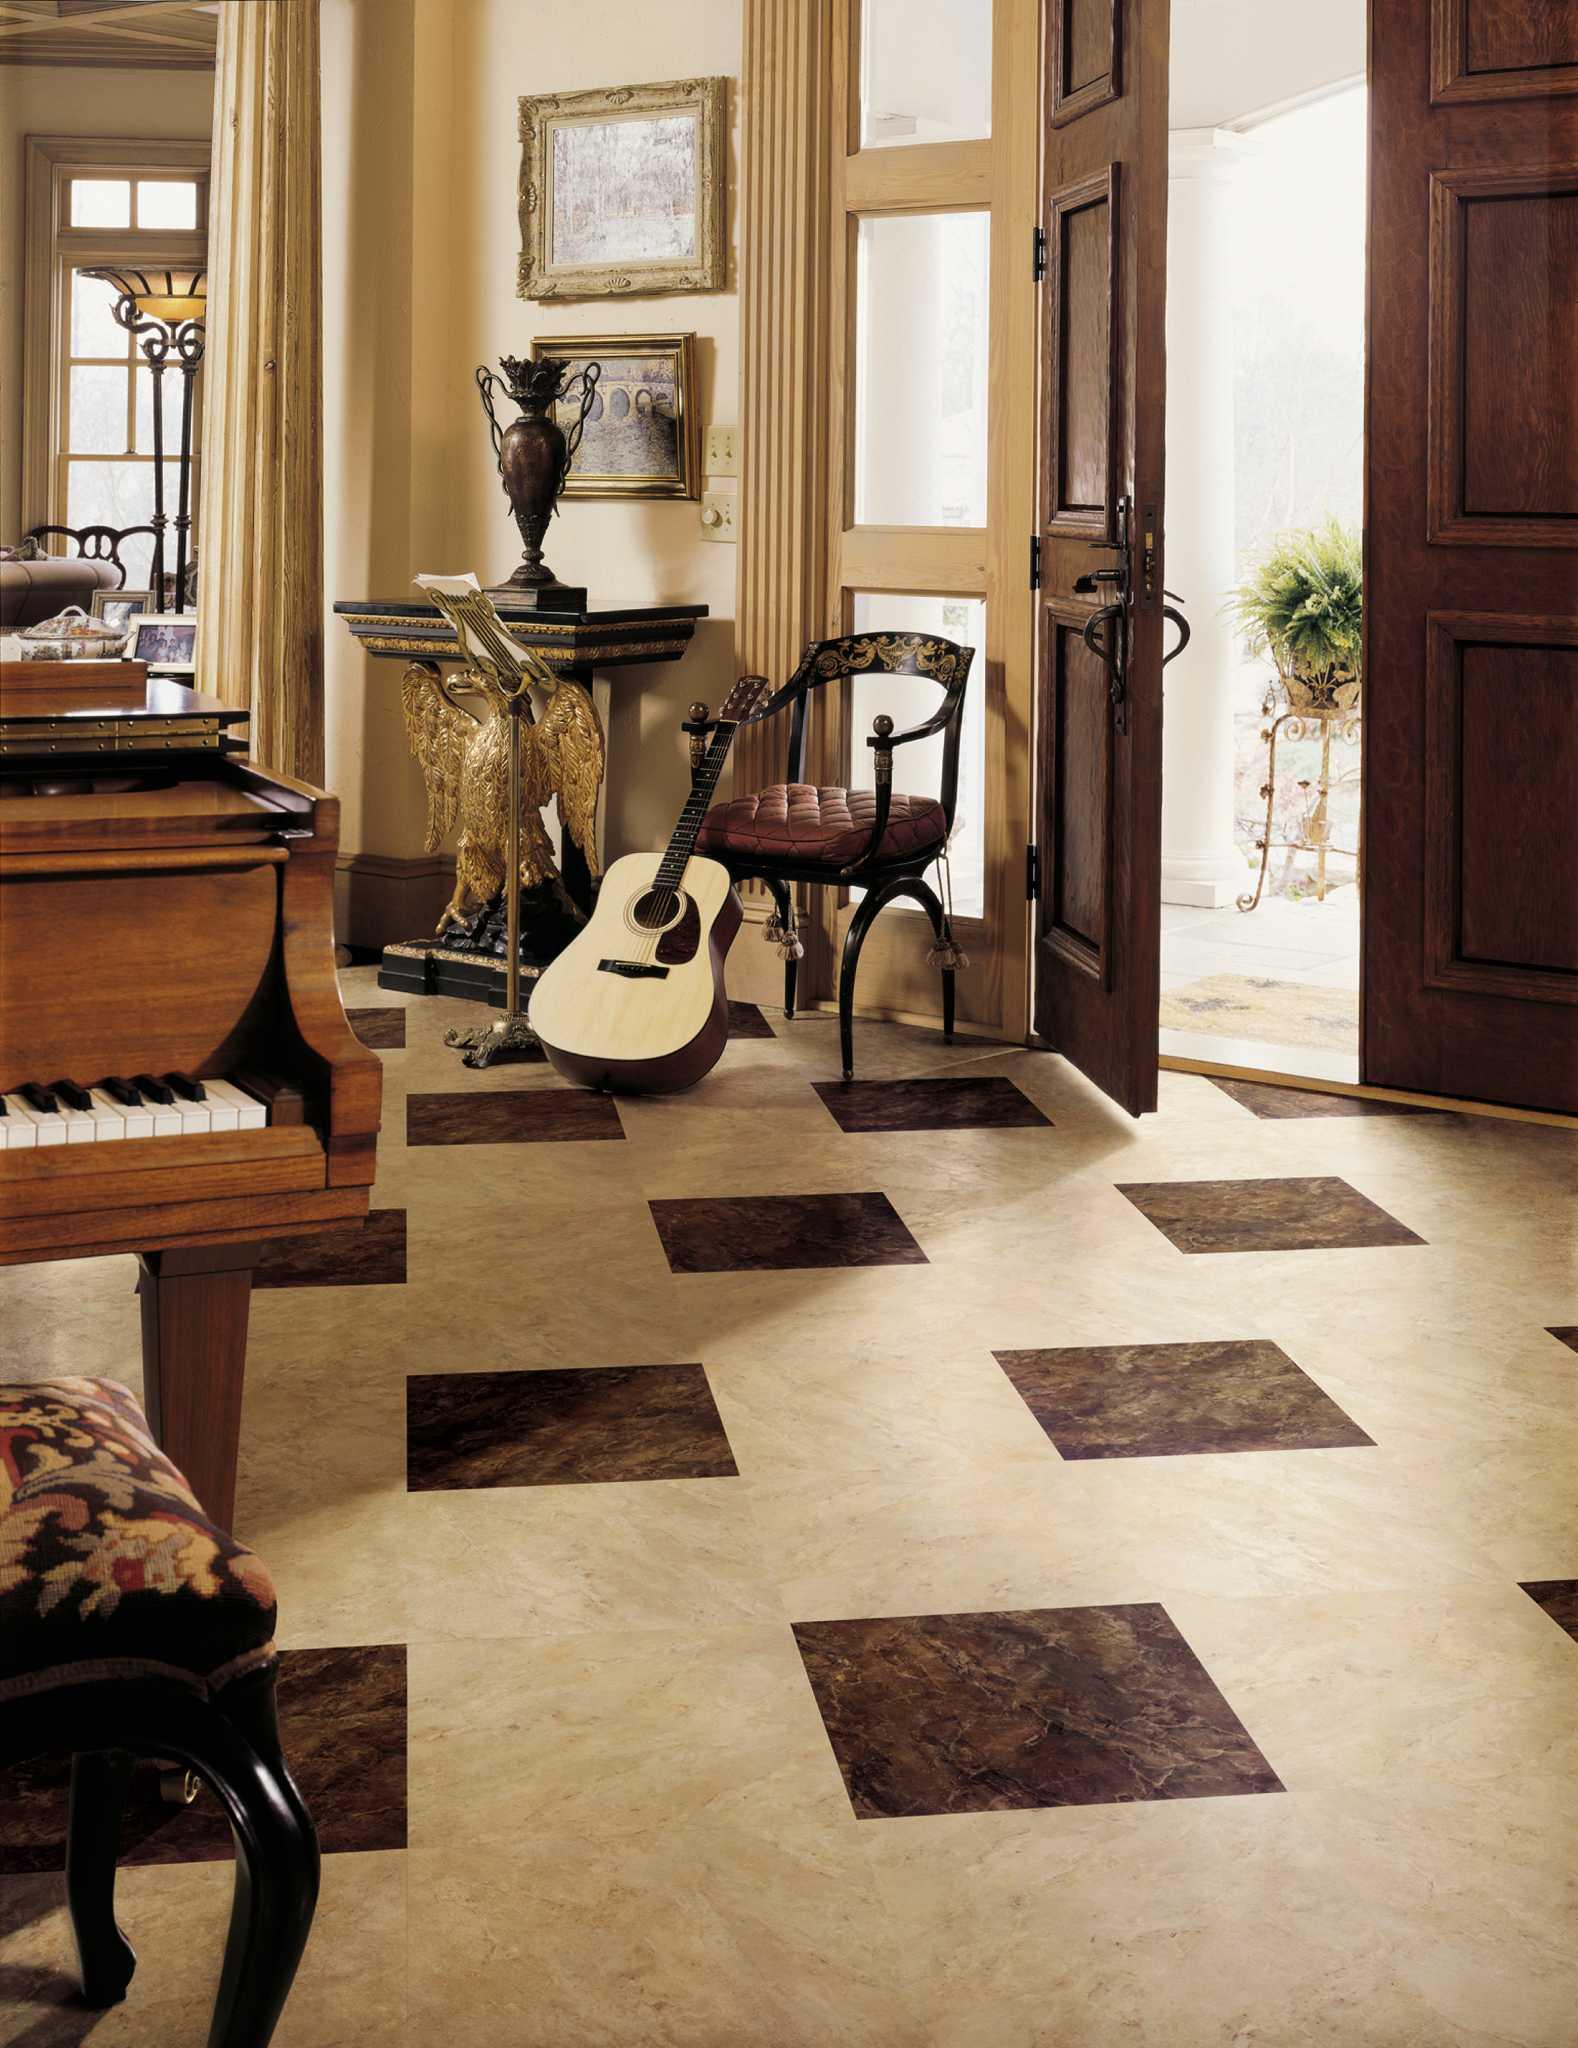 Modern luxury vinyl flooring fools the eye - Houston hronicle - ^